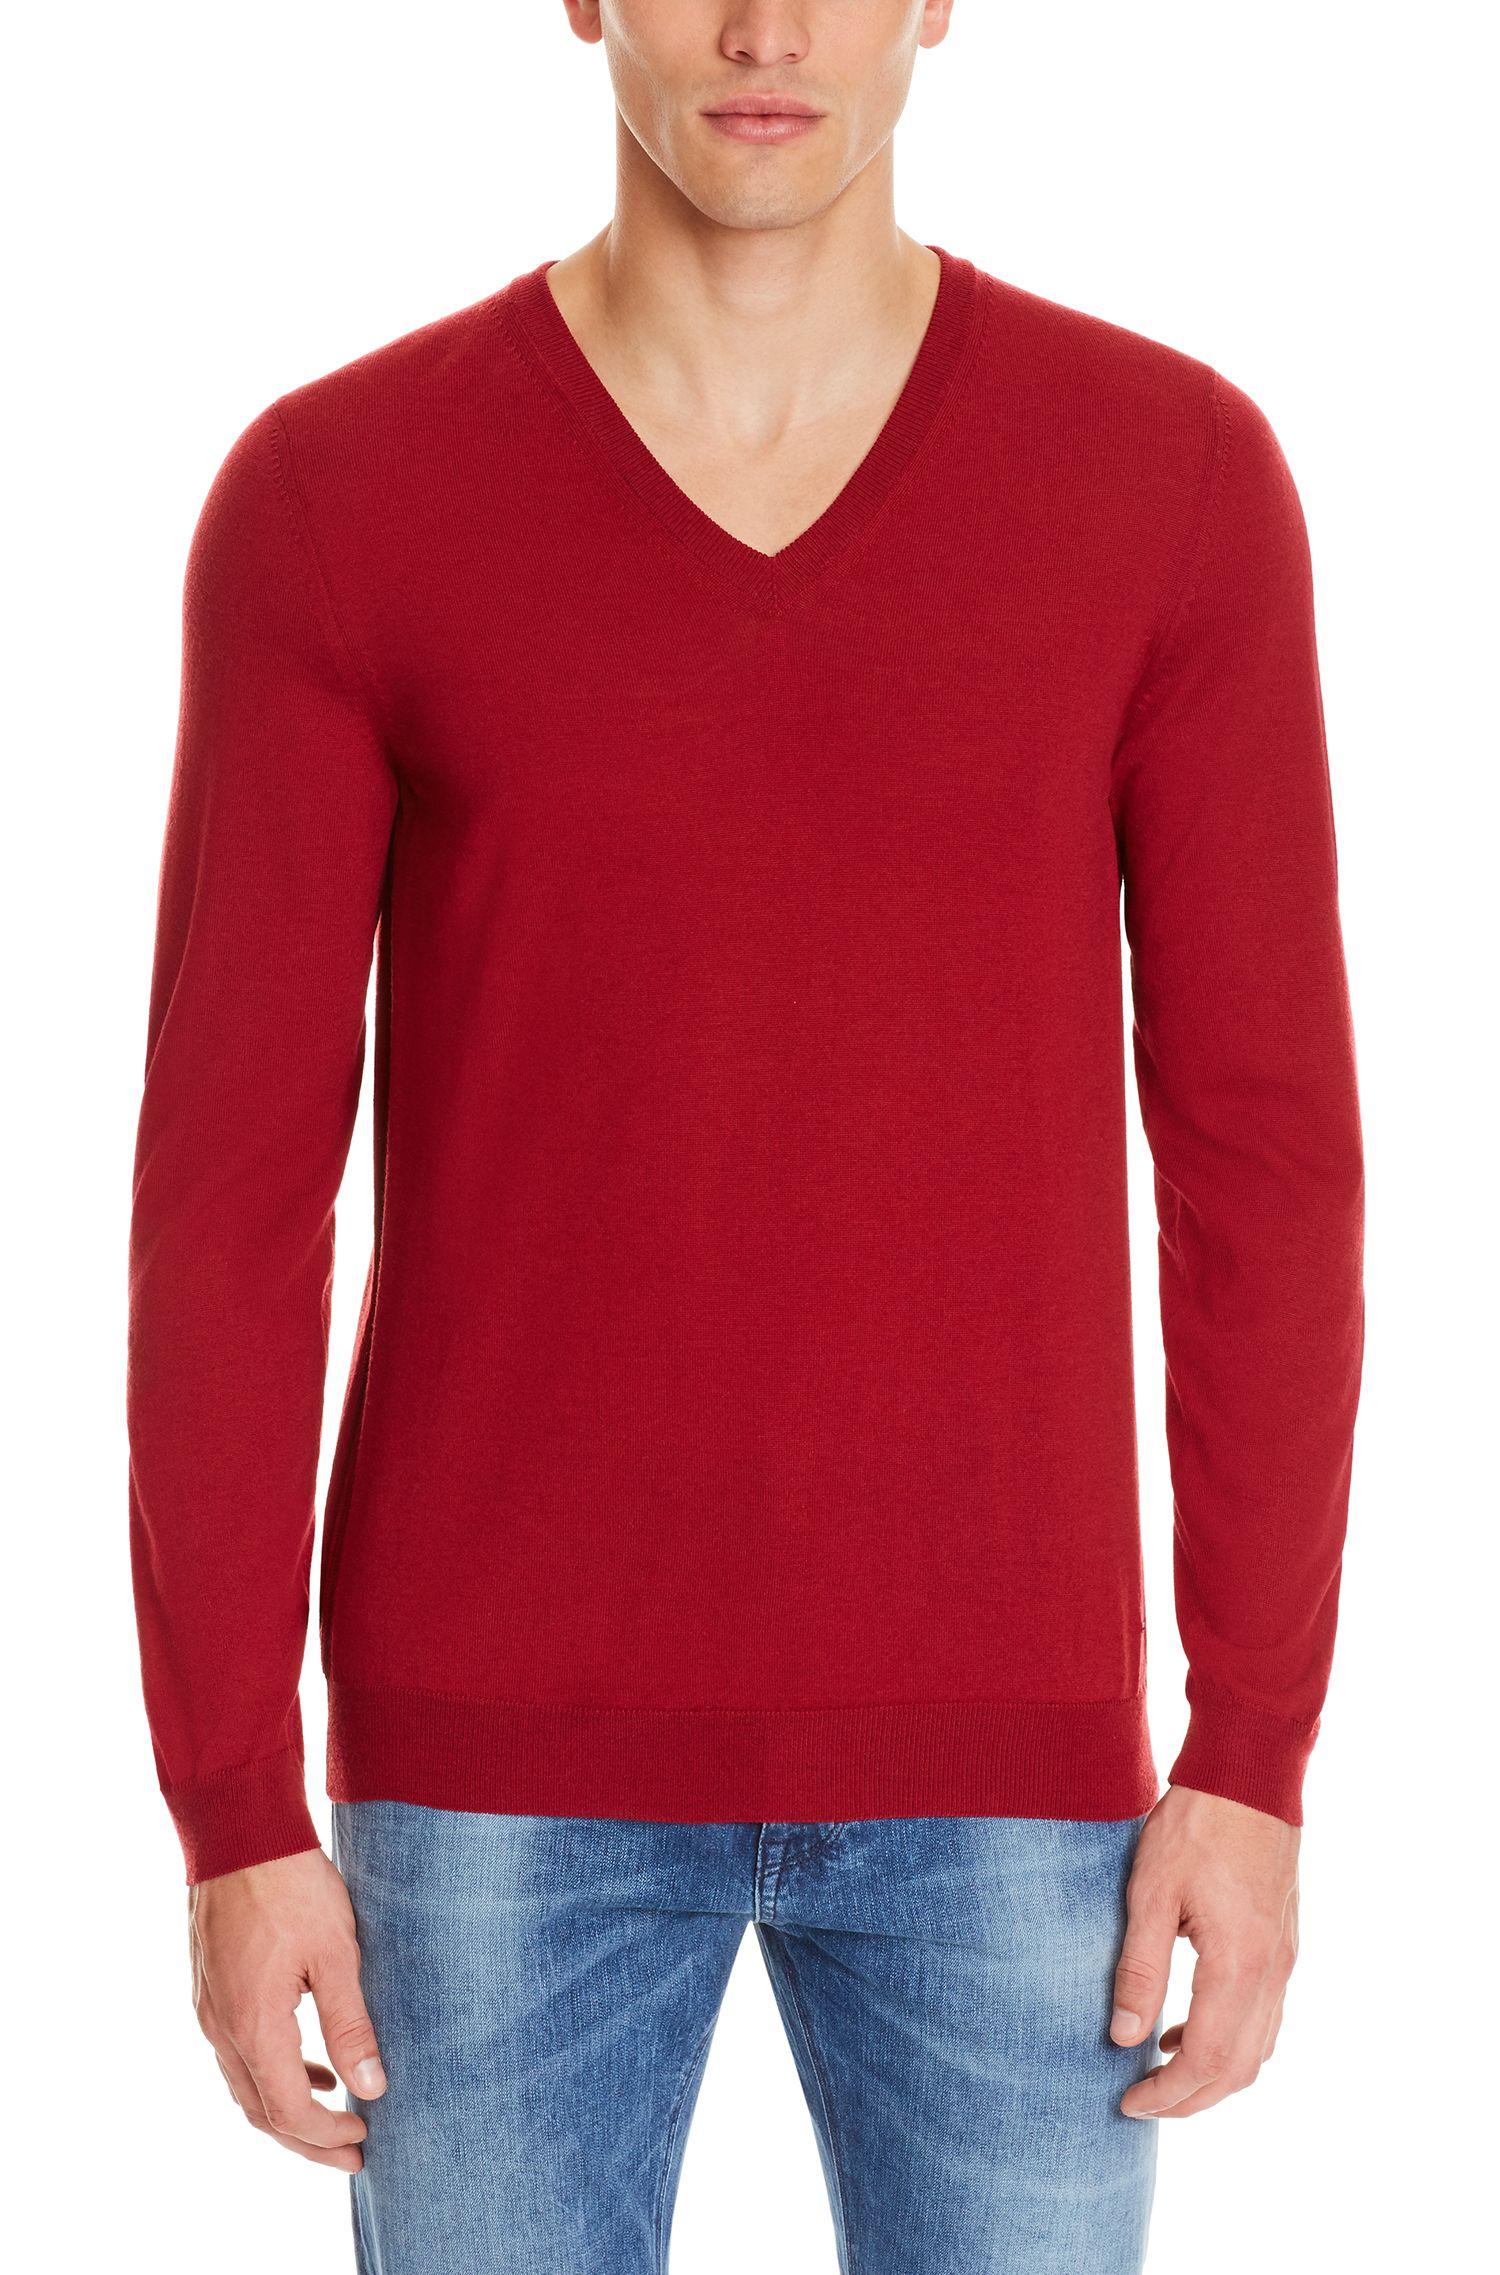 Extra-Fine Merino Wool Sweater, Slim Fit | Melba M